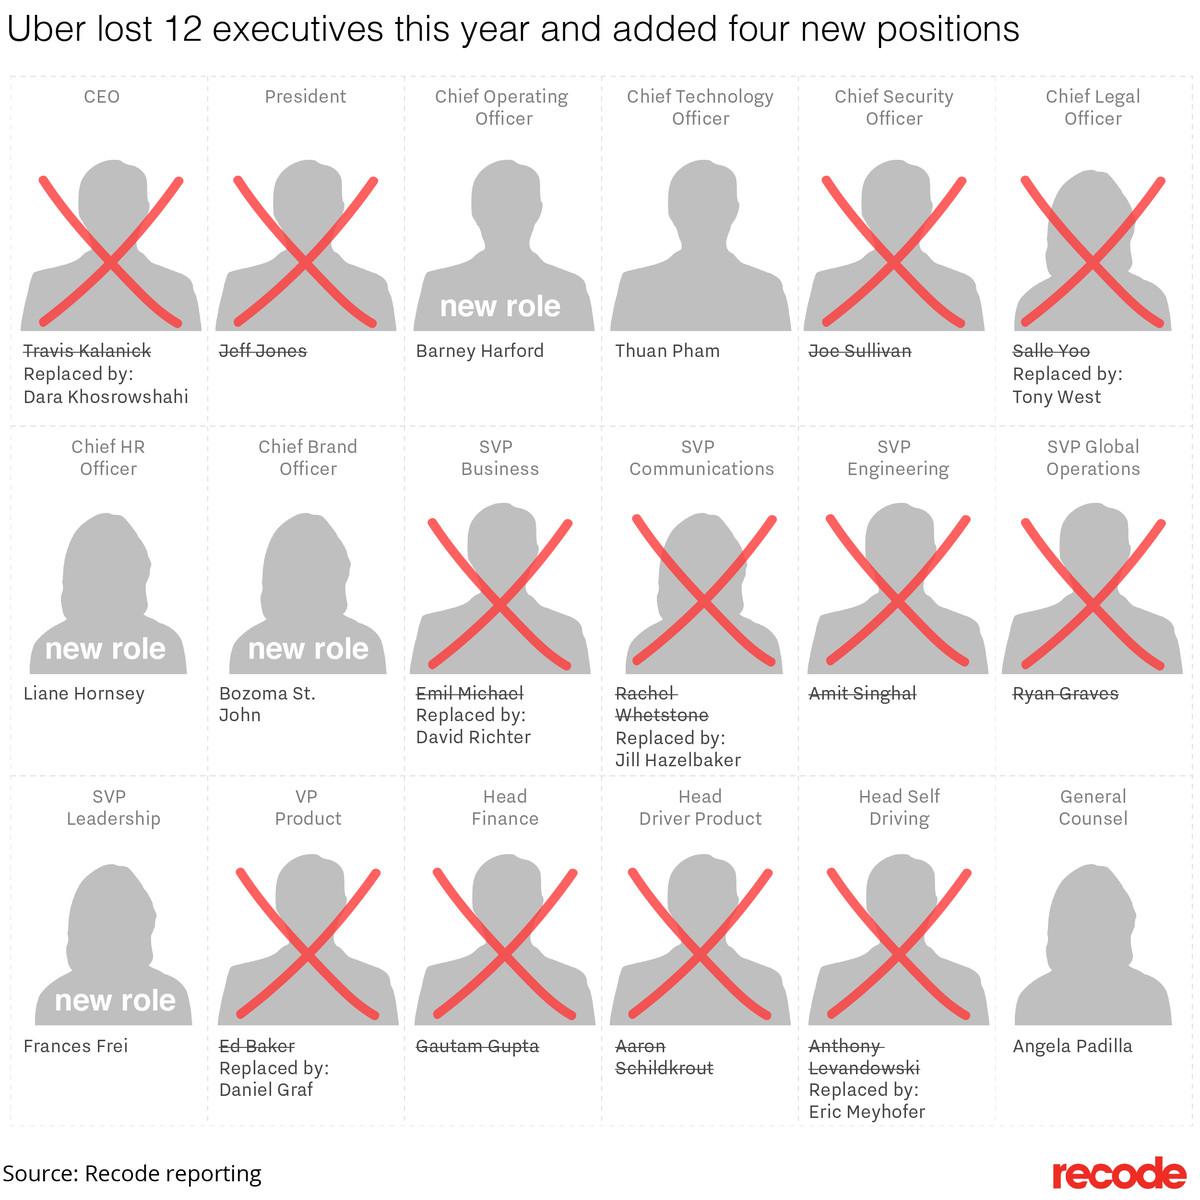 Uber executive turnover